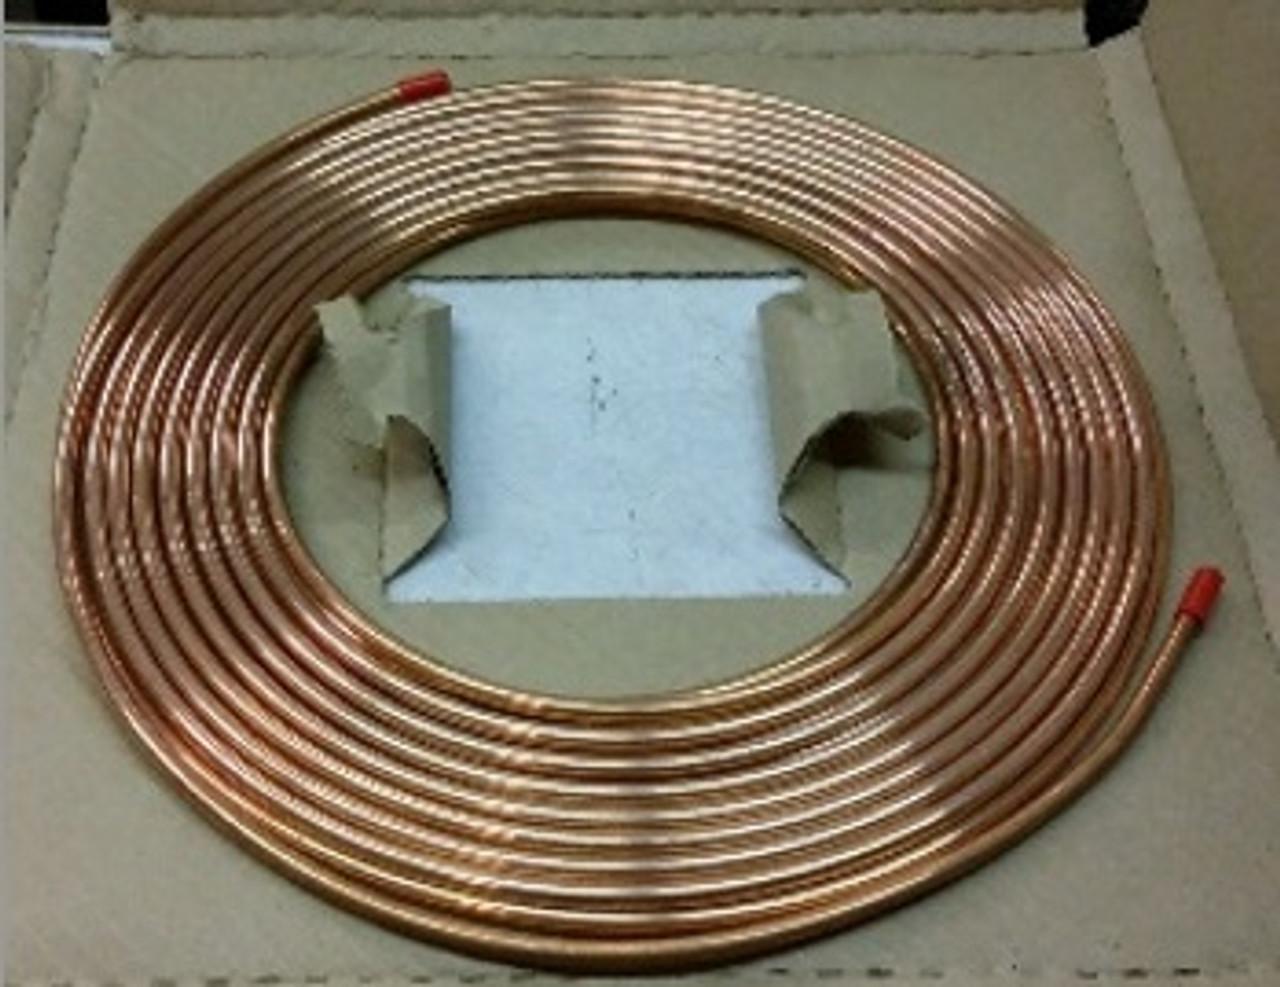 "COPPER TUBING 1/4"" x 50' (REFRIGERATOR GRADE)"